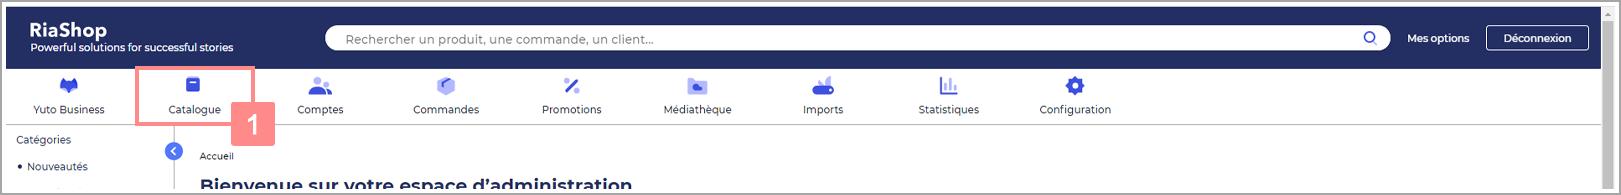 Rubrique Catalogue de Yuto Business